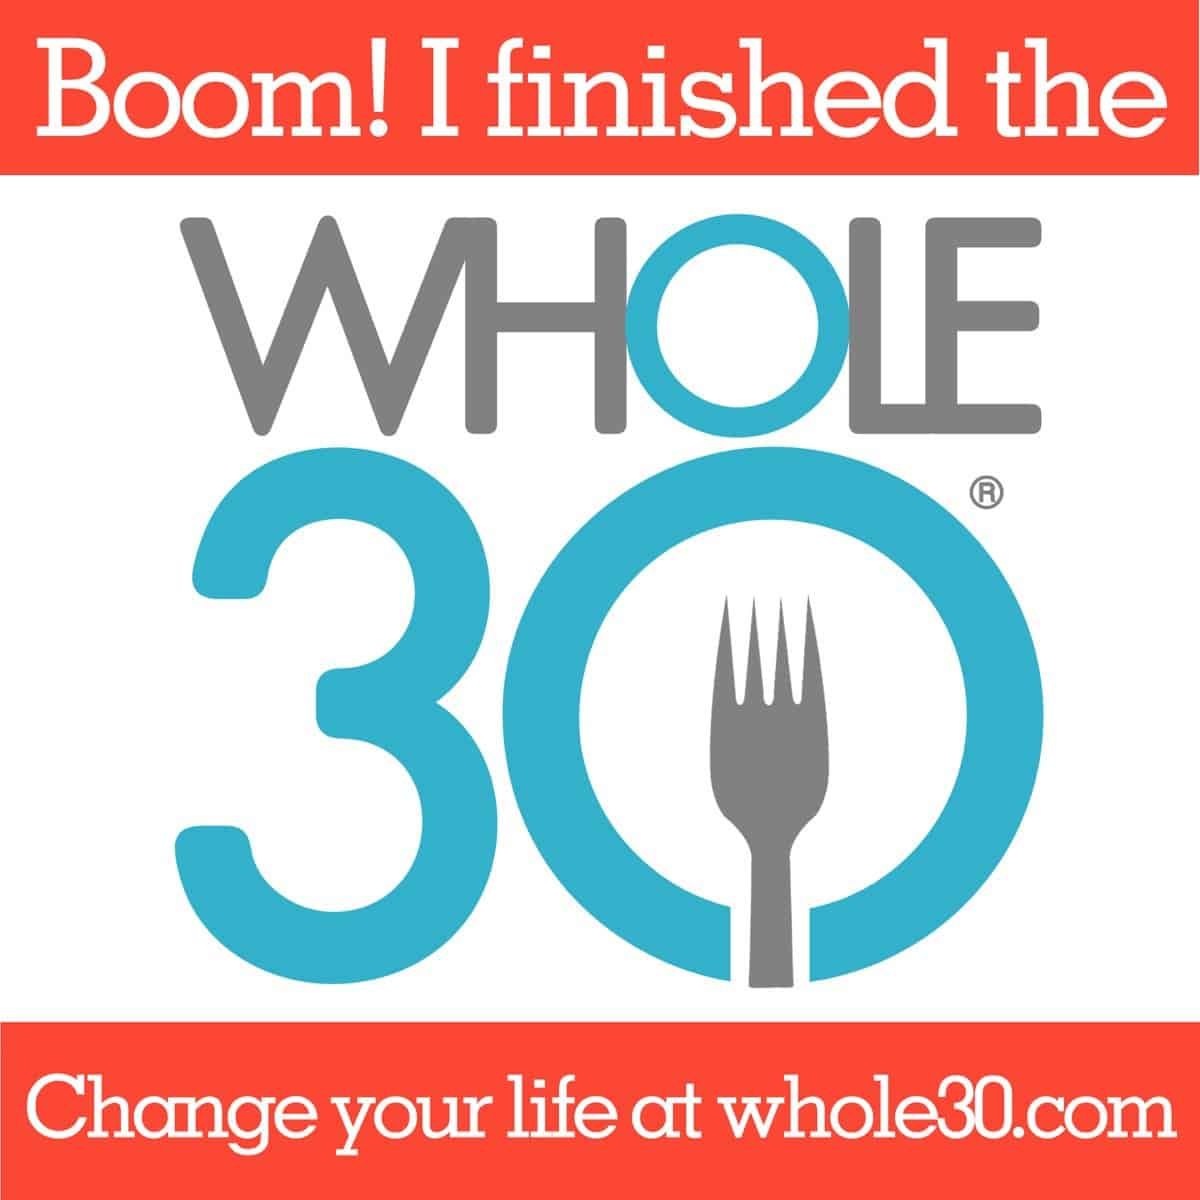 Whole30 Recap